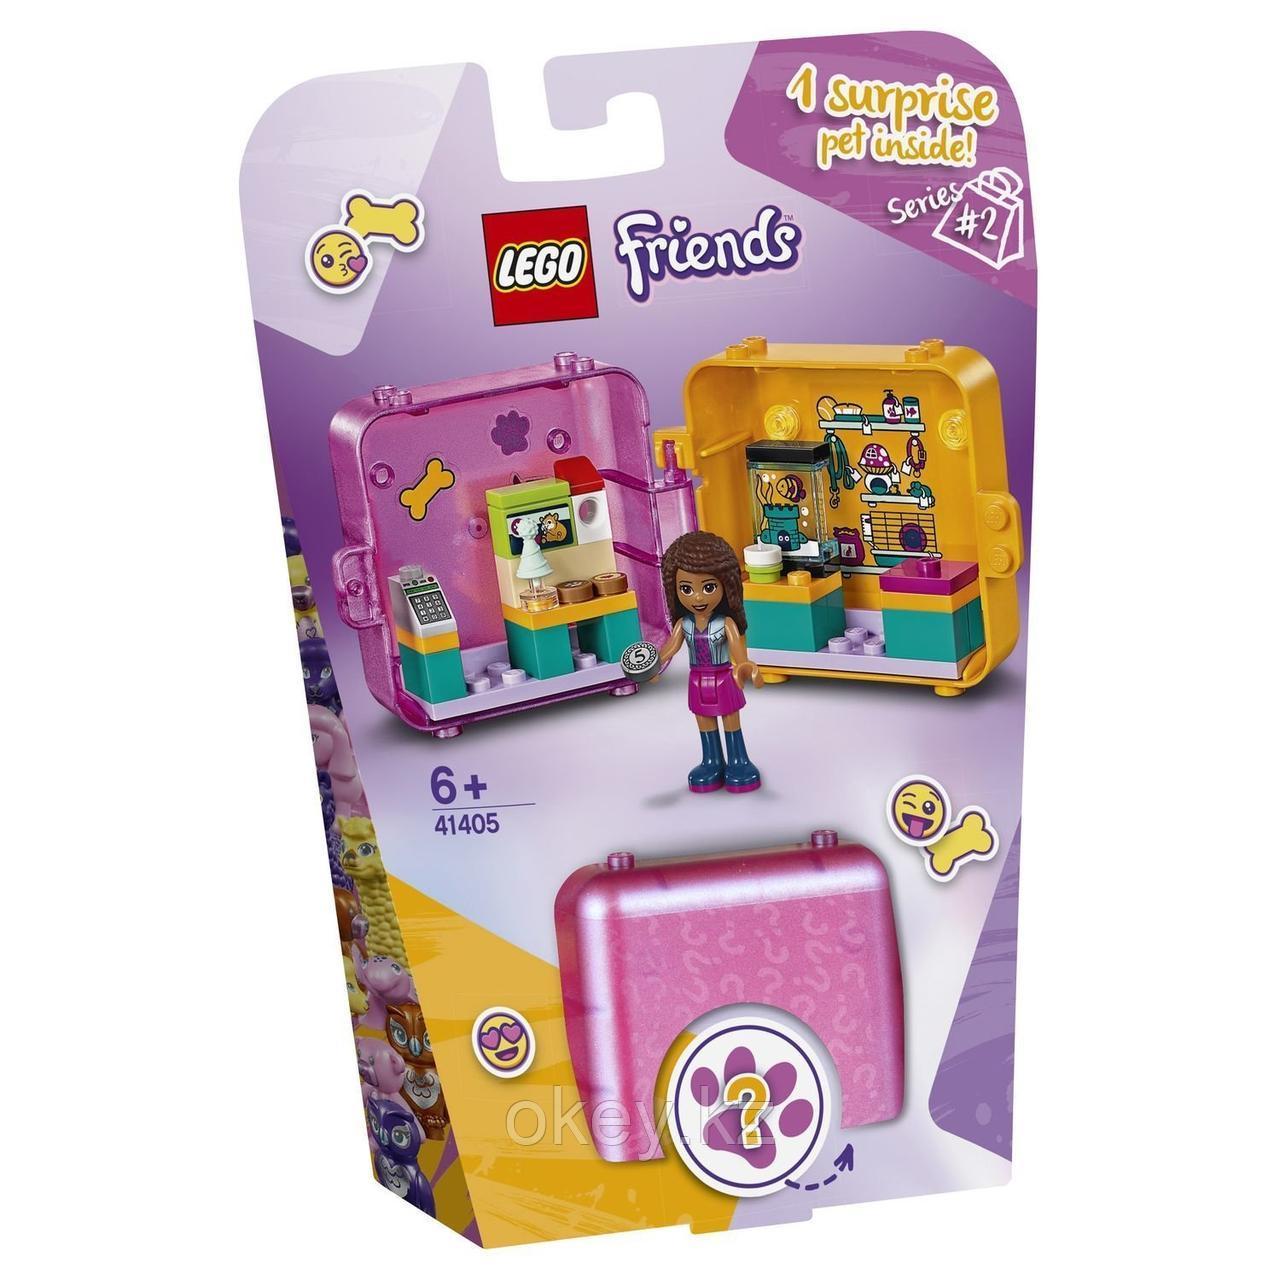 LEGO Friends: Игровая шкатулка Покупки Андреа 41405 - фото 1